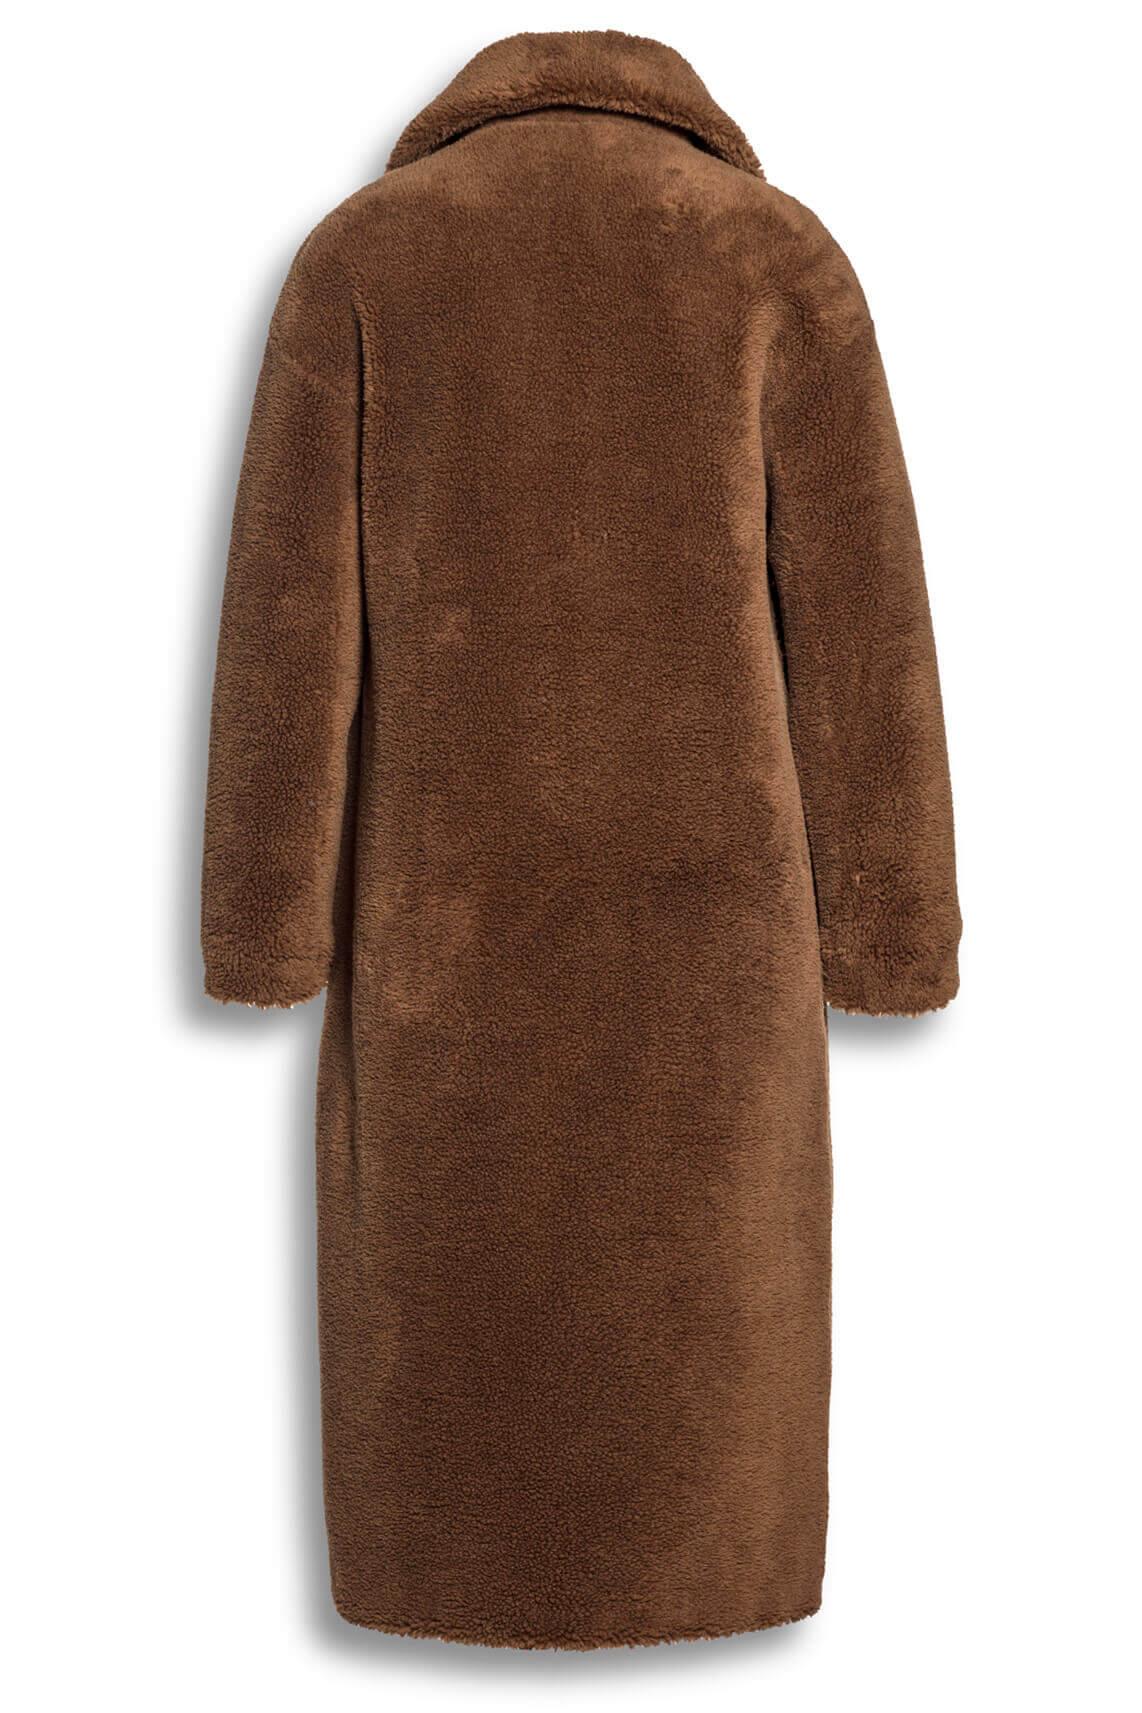 Beaumont Dames Lange teddy mantel Bruin